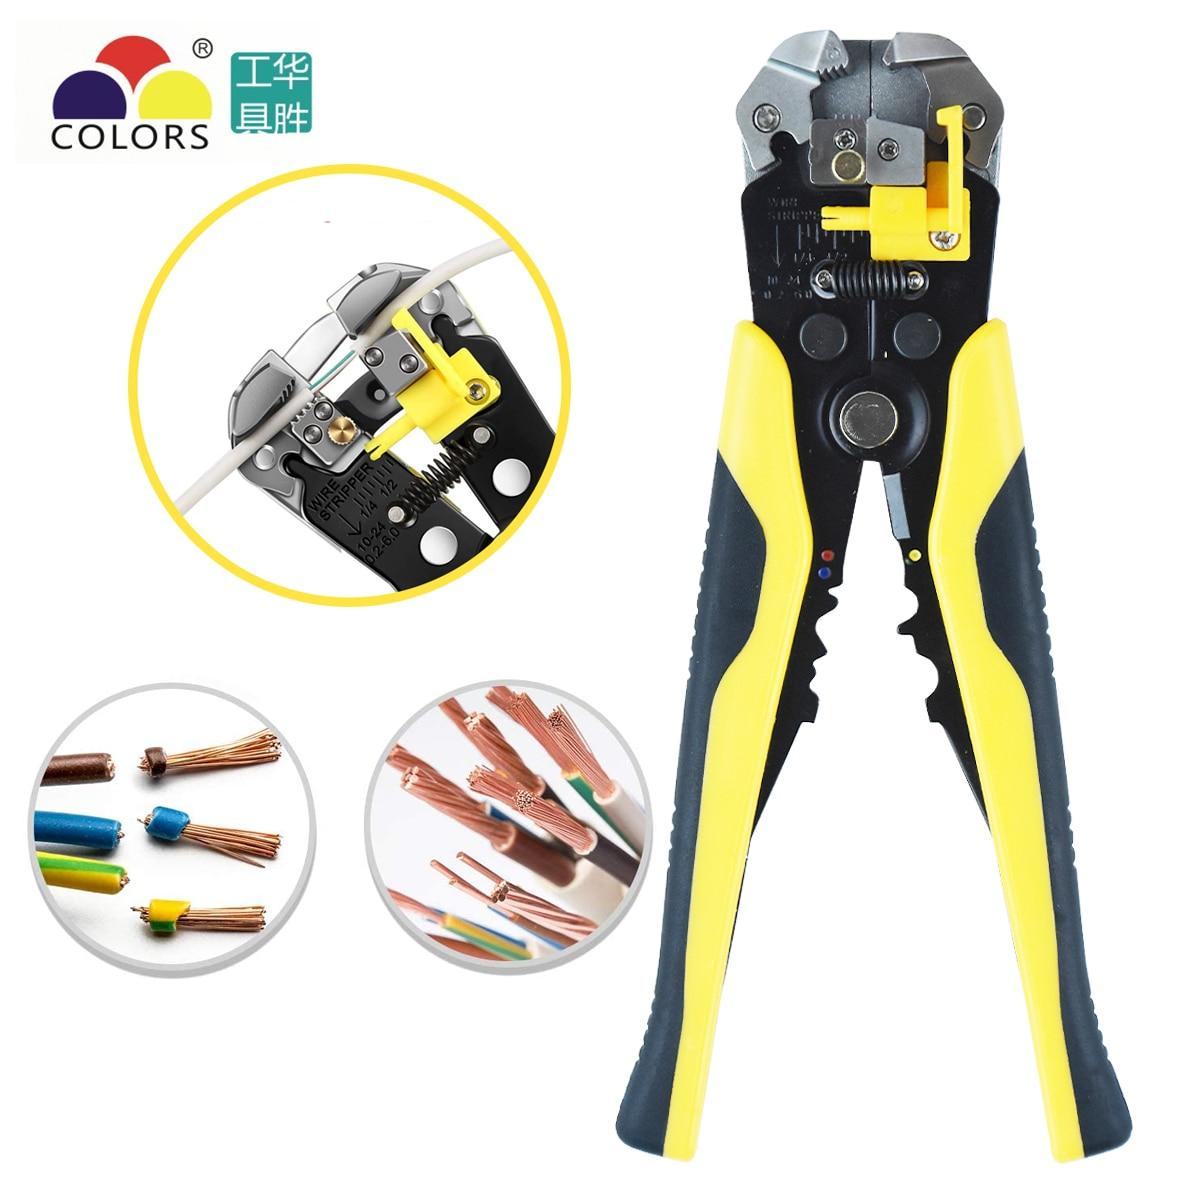 Pelacables de alambre de aislamiento autoajustable HS-D1 de AWG 10-24 herramienta automática de pelado de cables/Herramienta de alicates de corte